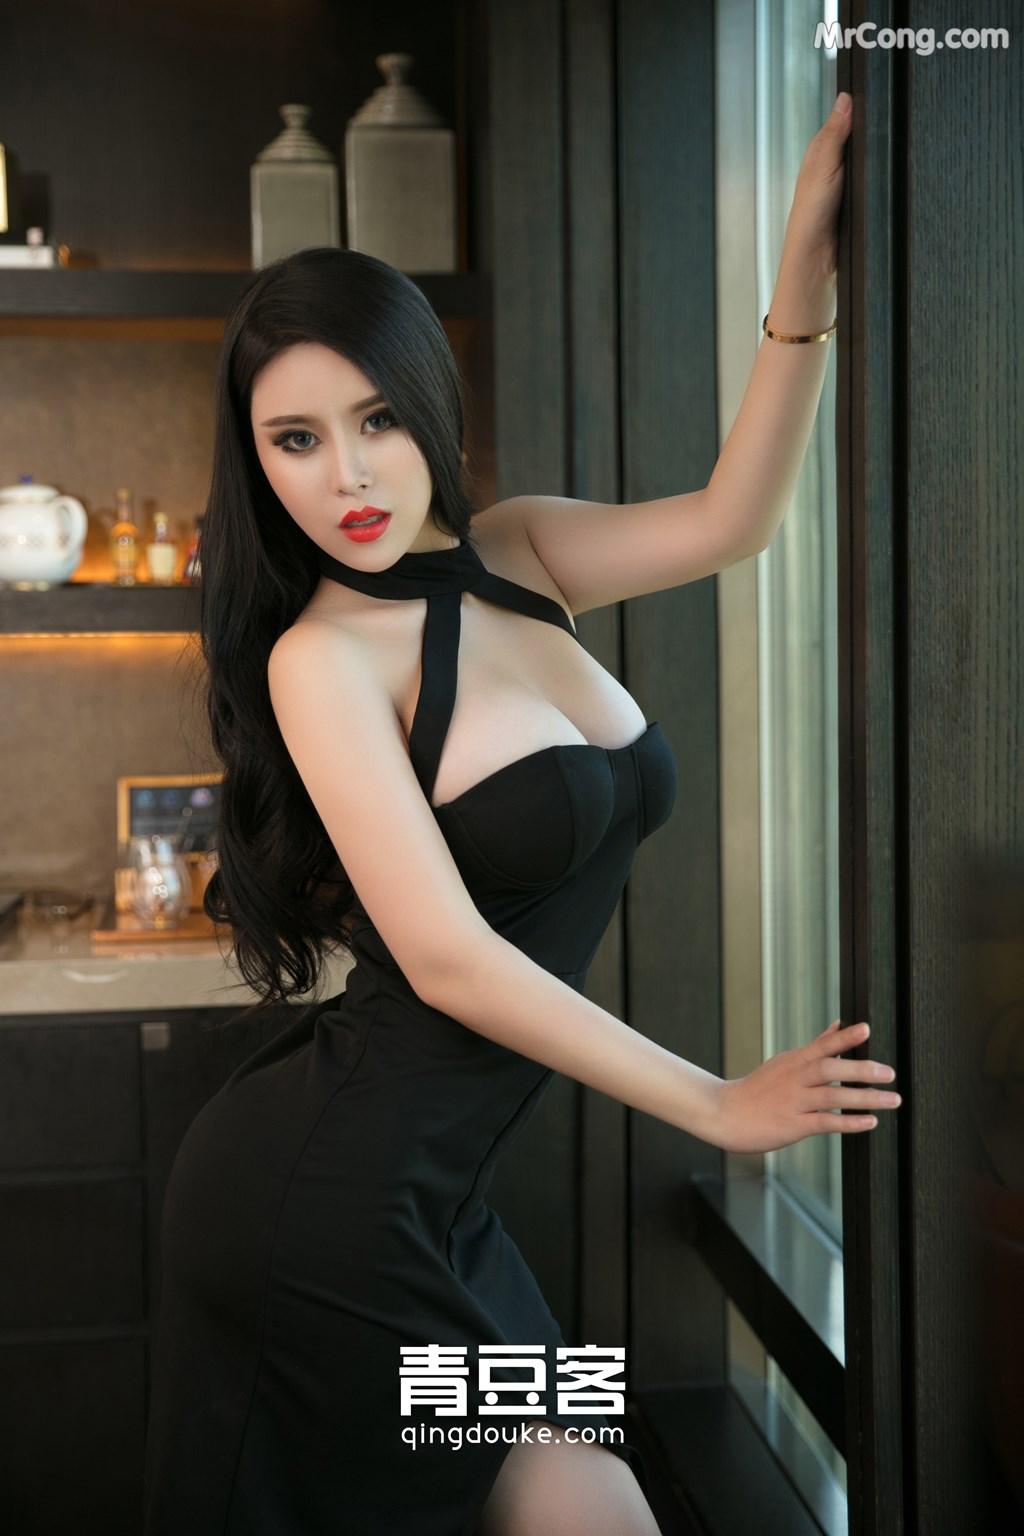 Image QingDouKe-2017-11-05-Ke-Rui-Na-MrCong.com-007 in post QingDouKe 2017-11-05: Người mẫu Ke Rui Na (可蕊娜) (48 ảnh)